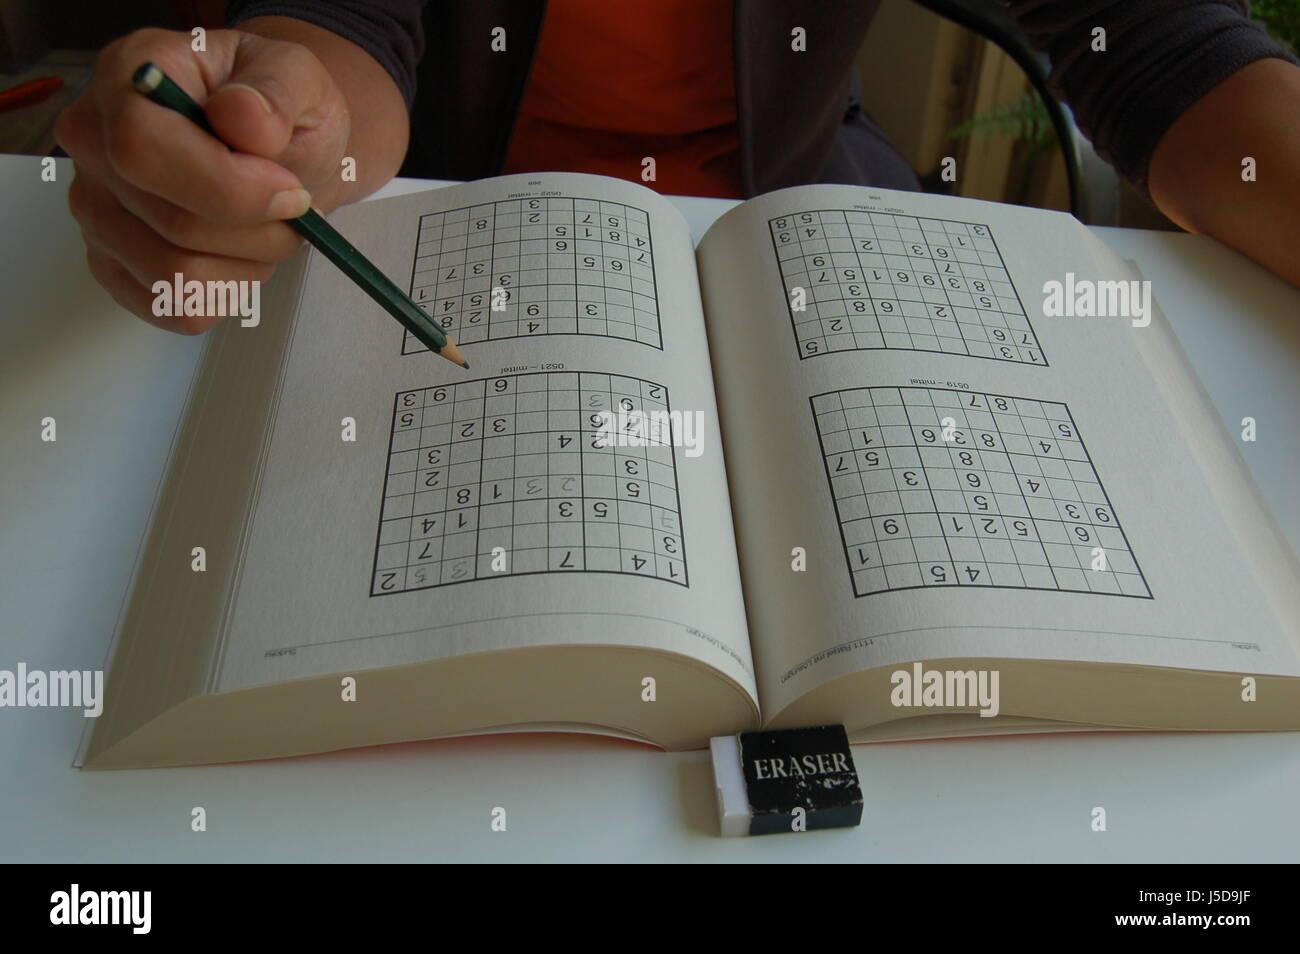 Eraser Puzzle Stock Photos & Eraser Puzzle Stock Images - Alamy